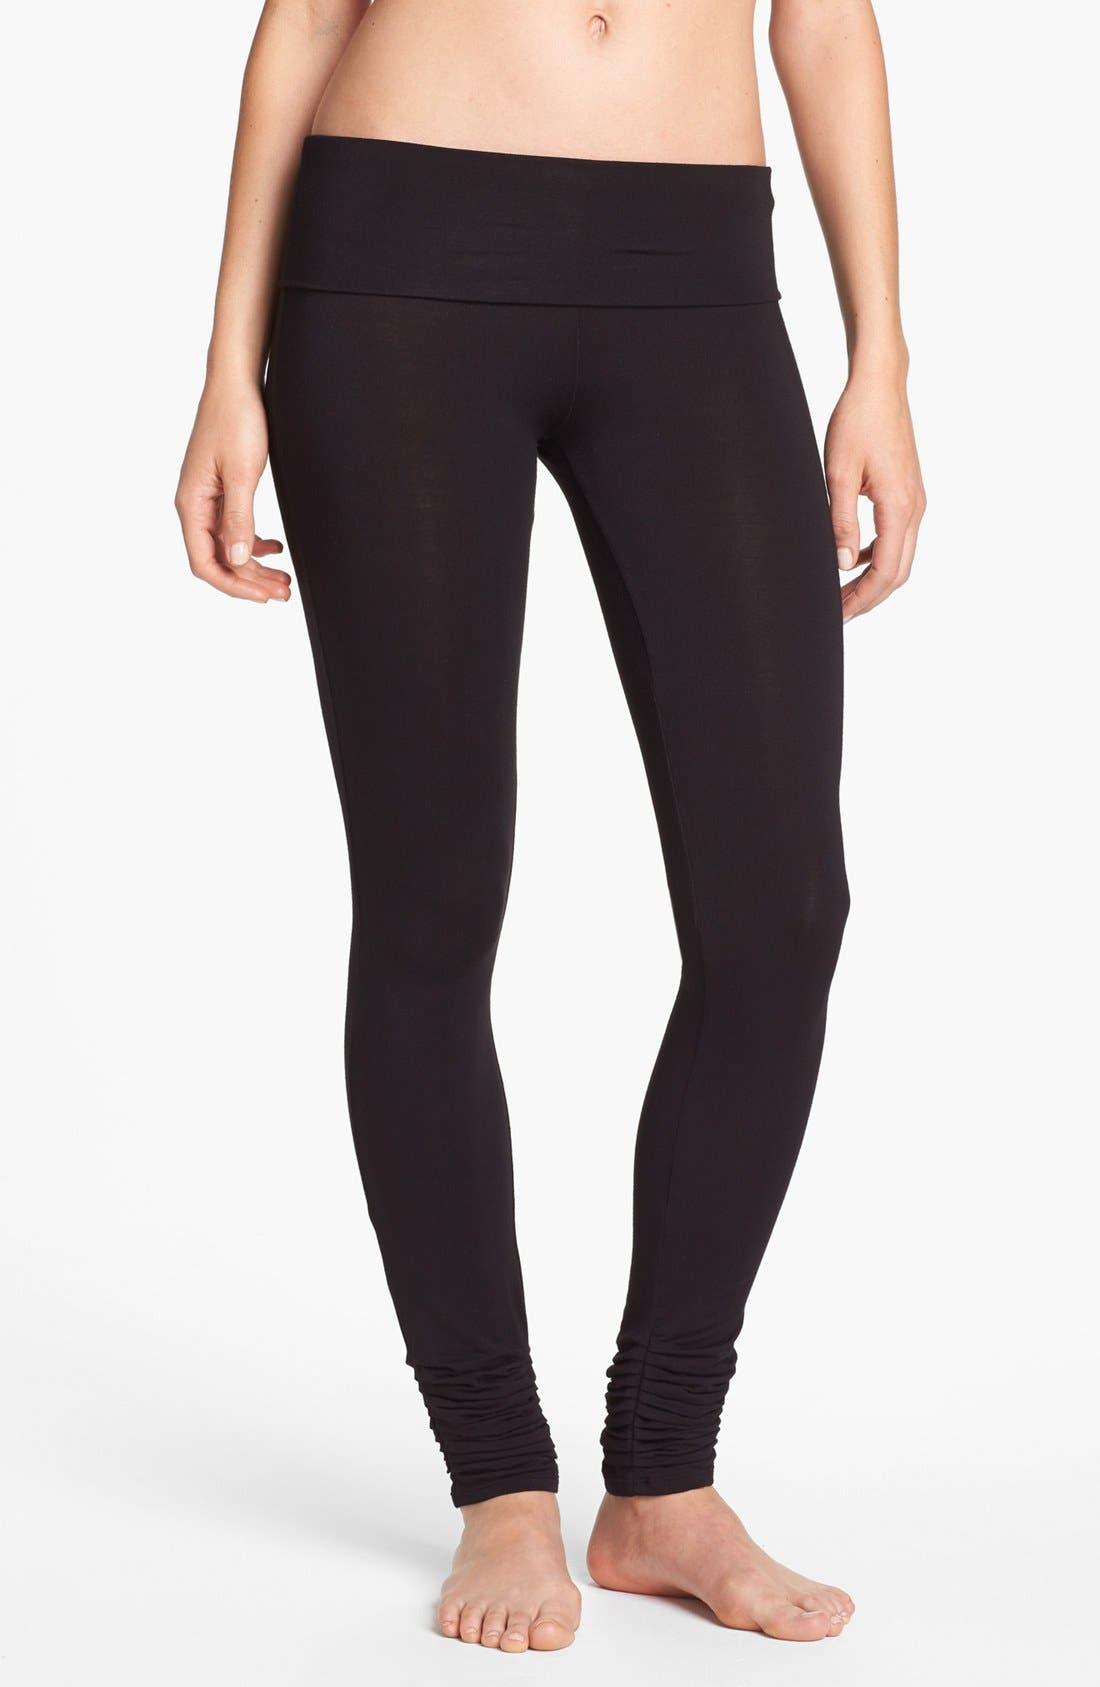 Main Image - DKNY 'Soho Mews Yoga Skinnies' Leggings